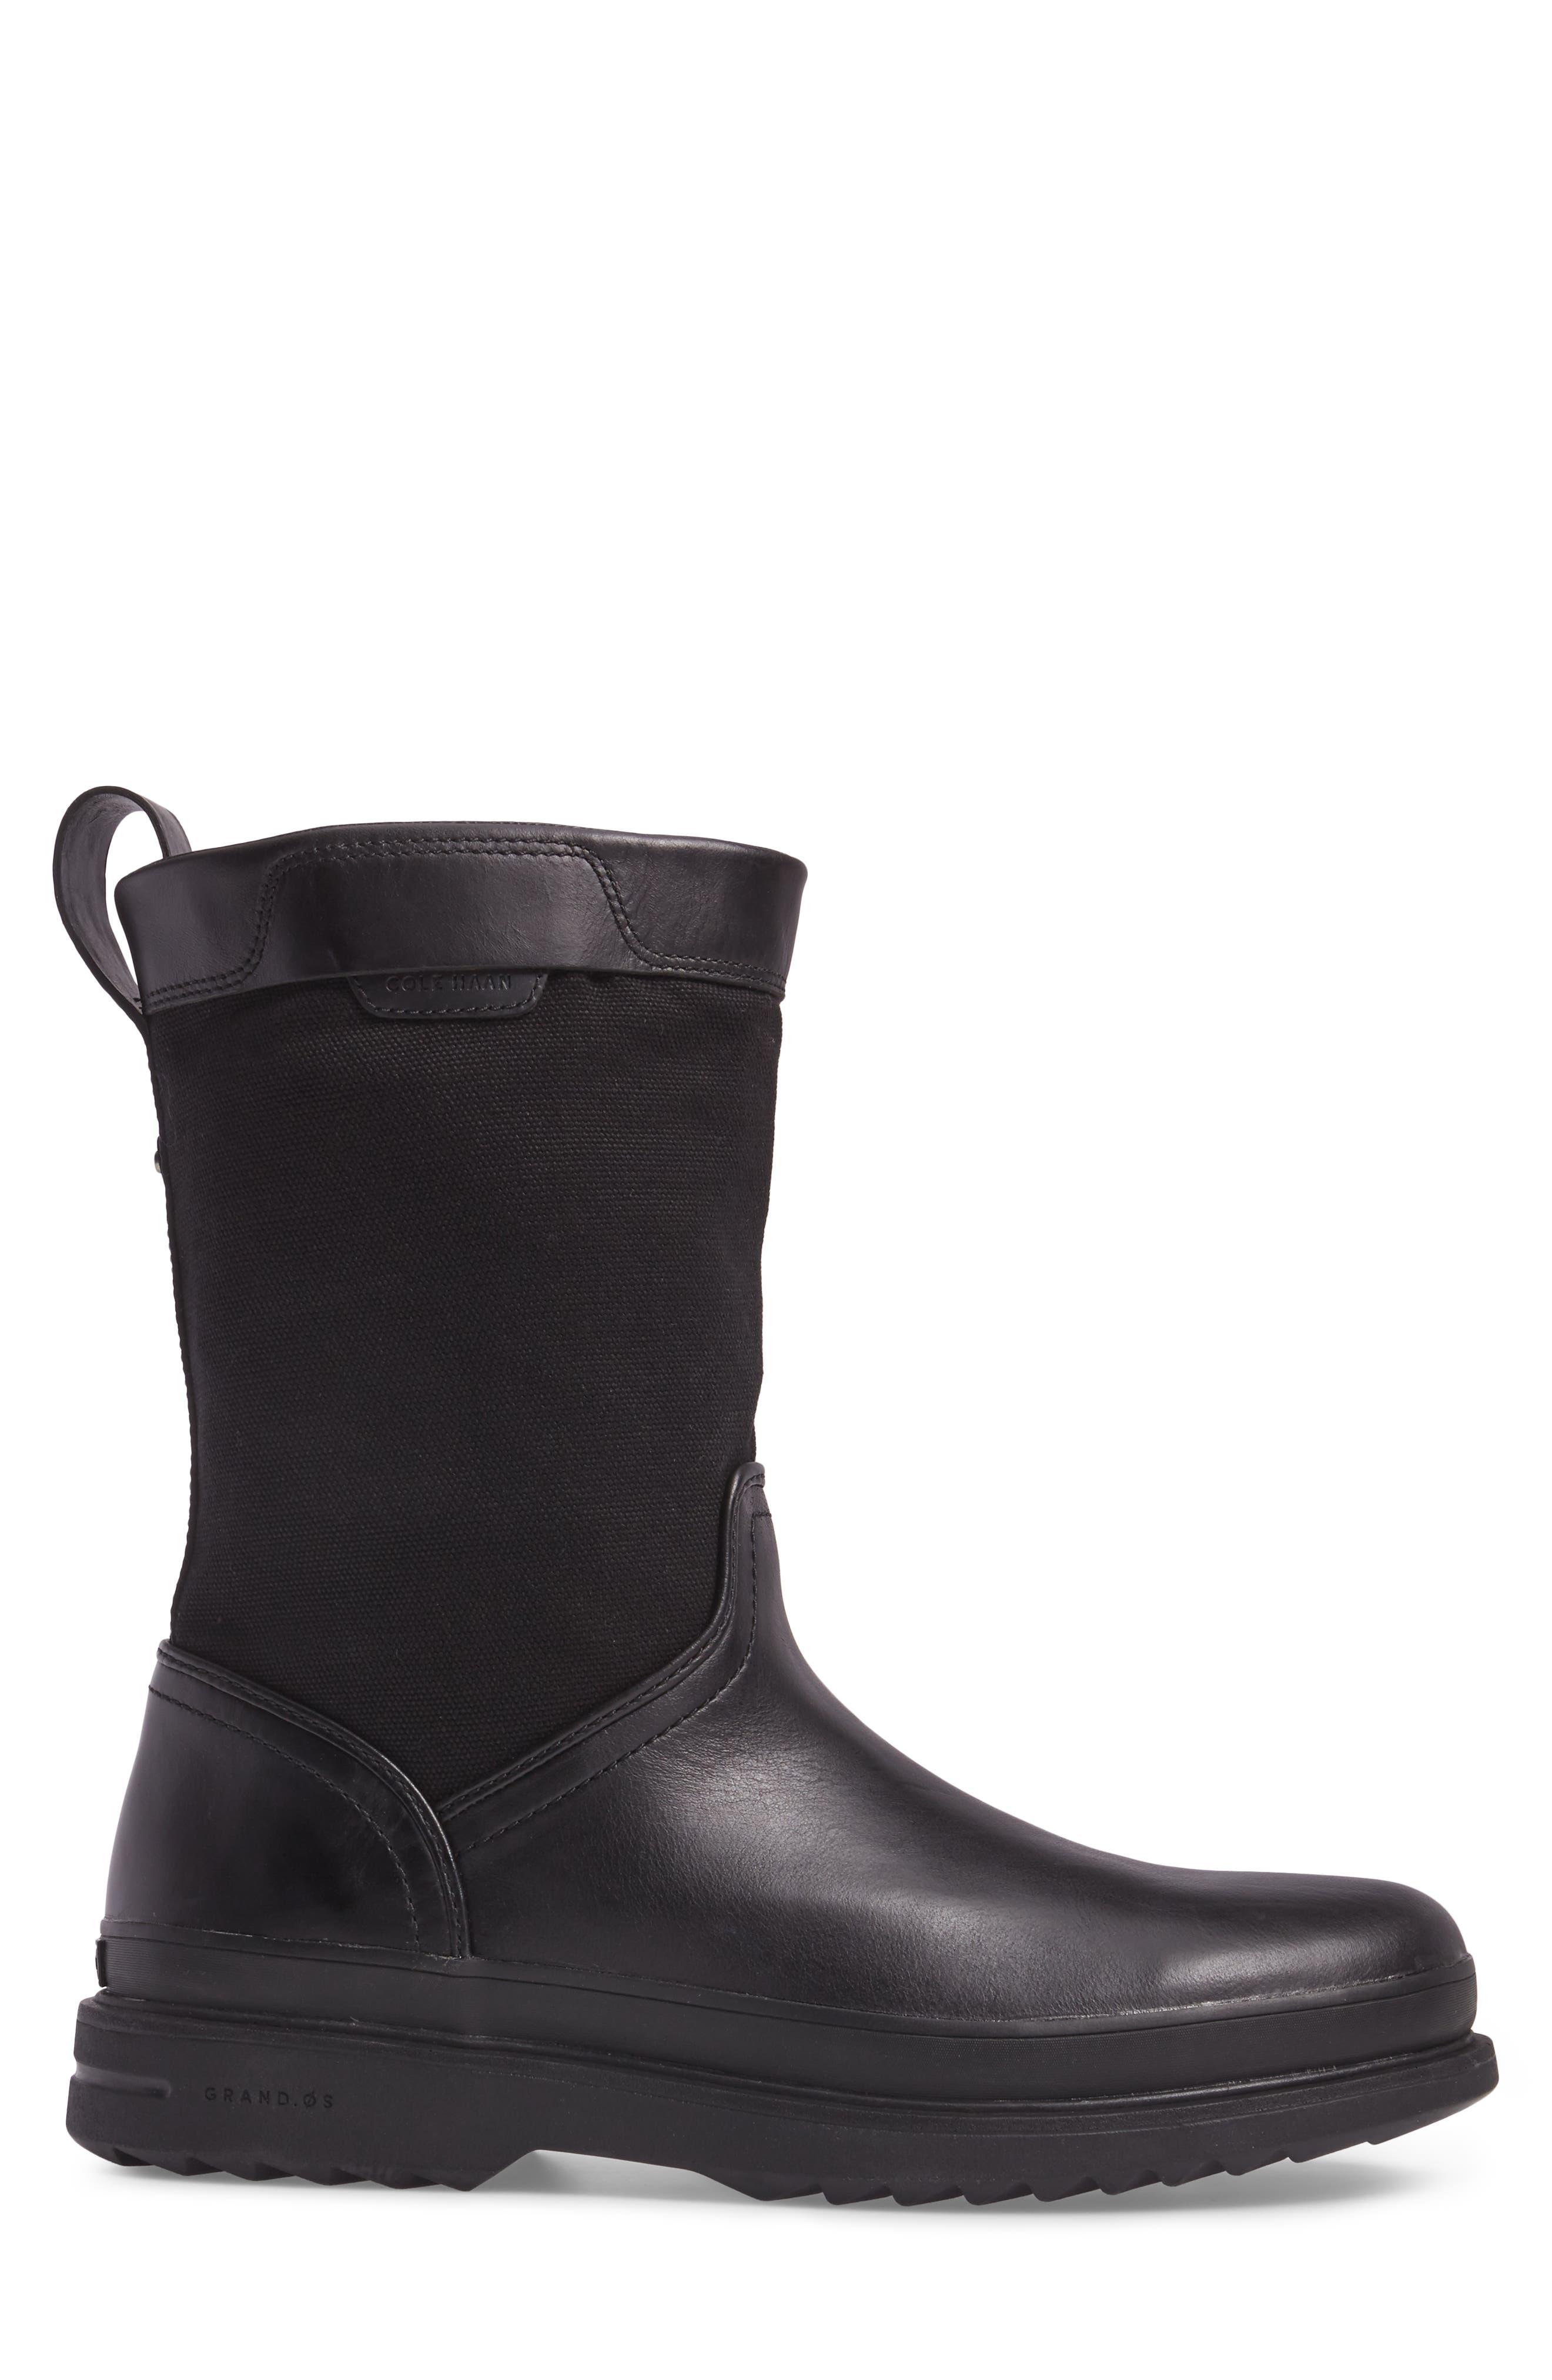 Millbridge Waterproof Boot,                             Alternate thumbnail 3, color,                             002